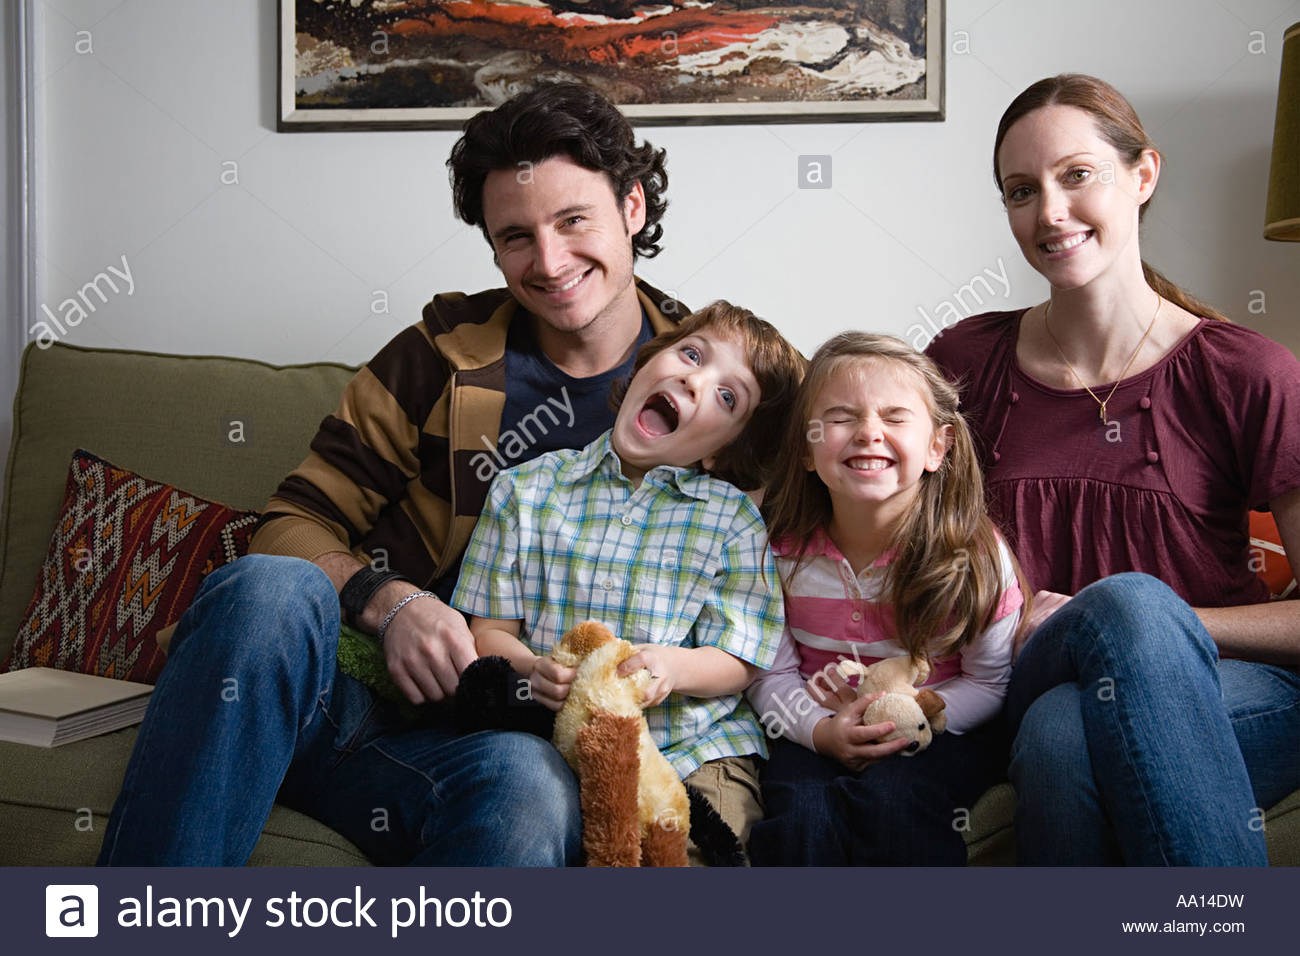 Cheeky children in family portrait - Stock Image